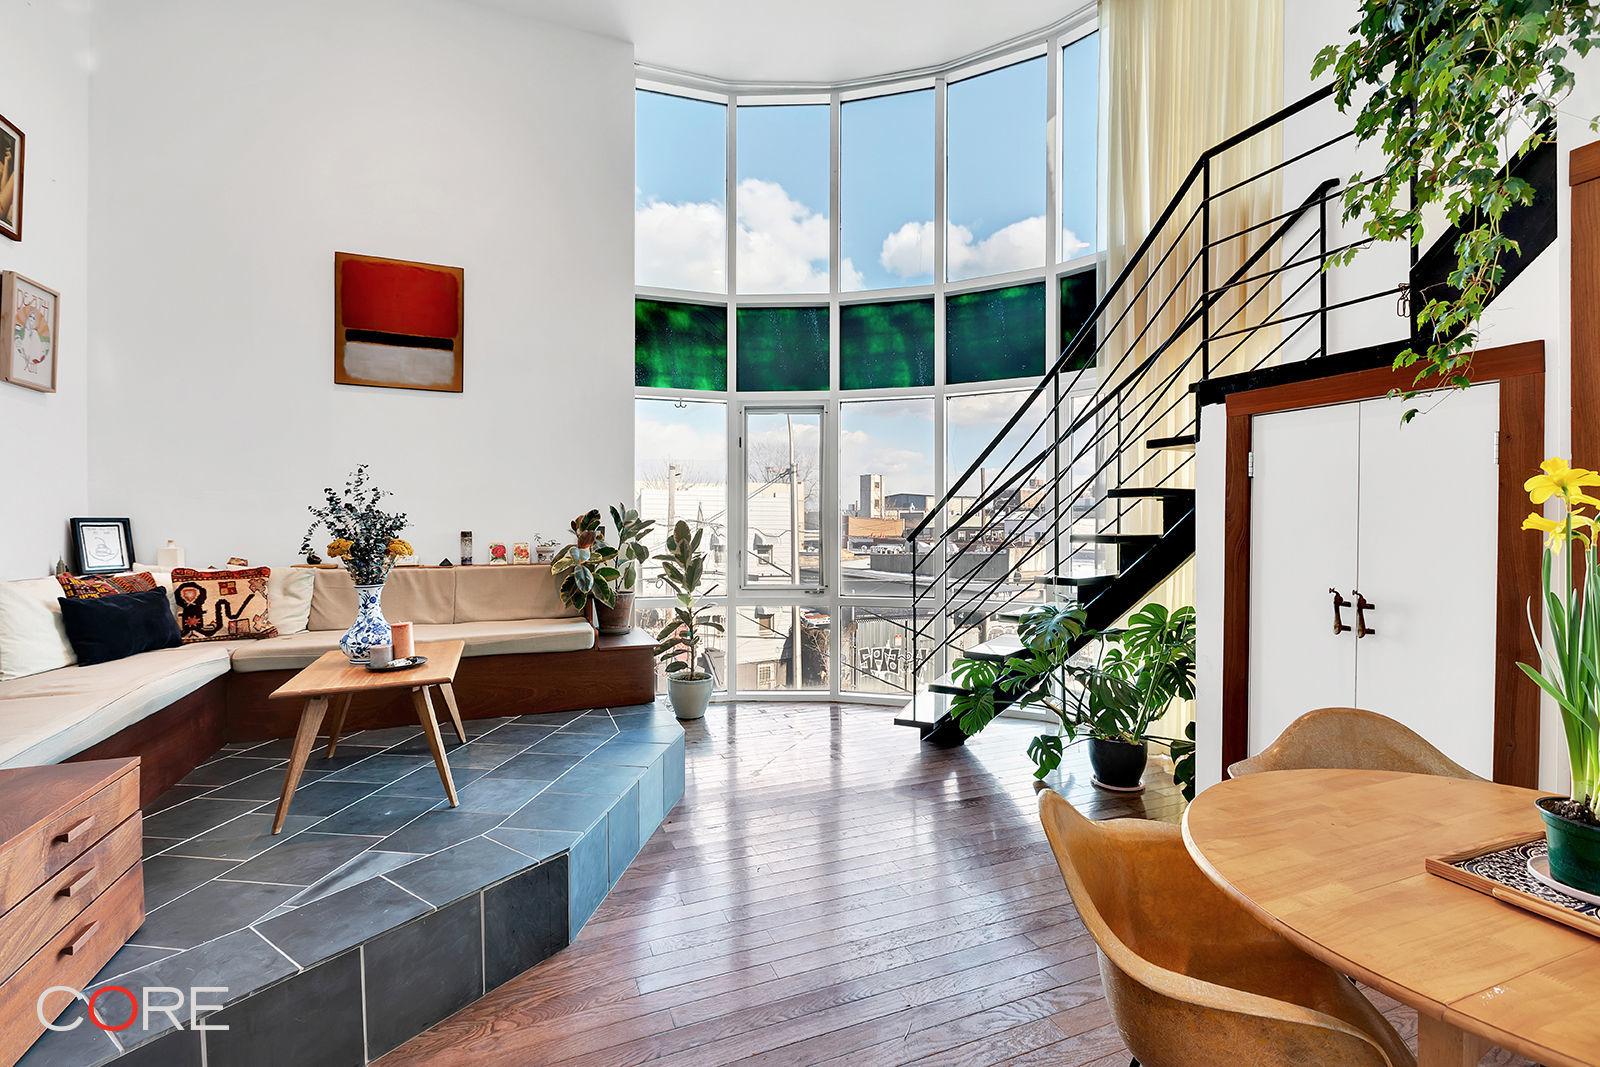 Apartment for sale at 117 Kingsland Avenue, Apt 3A